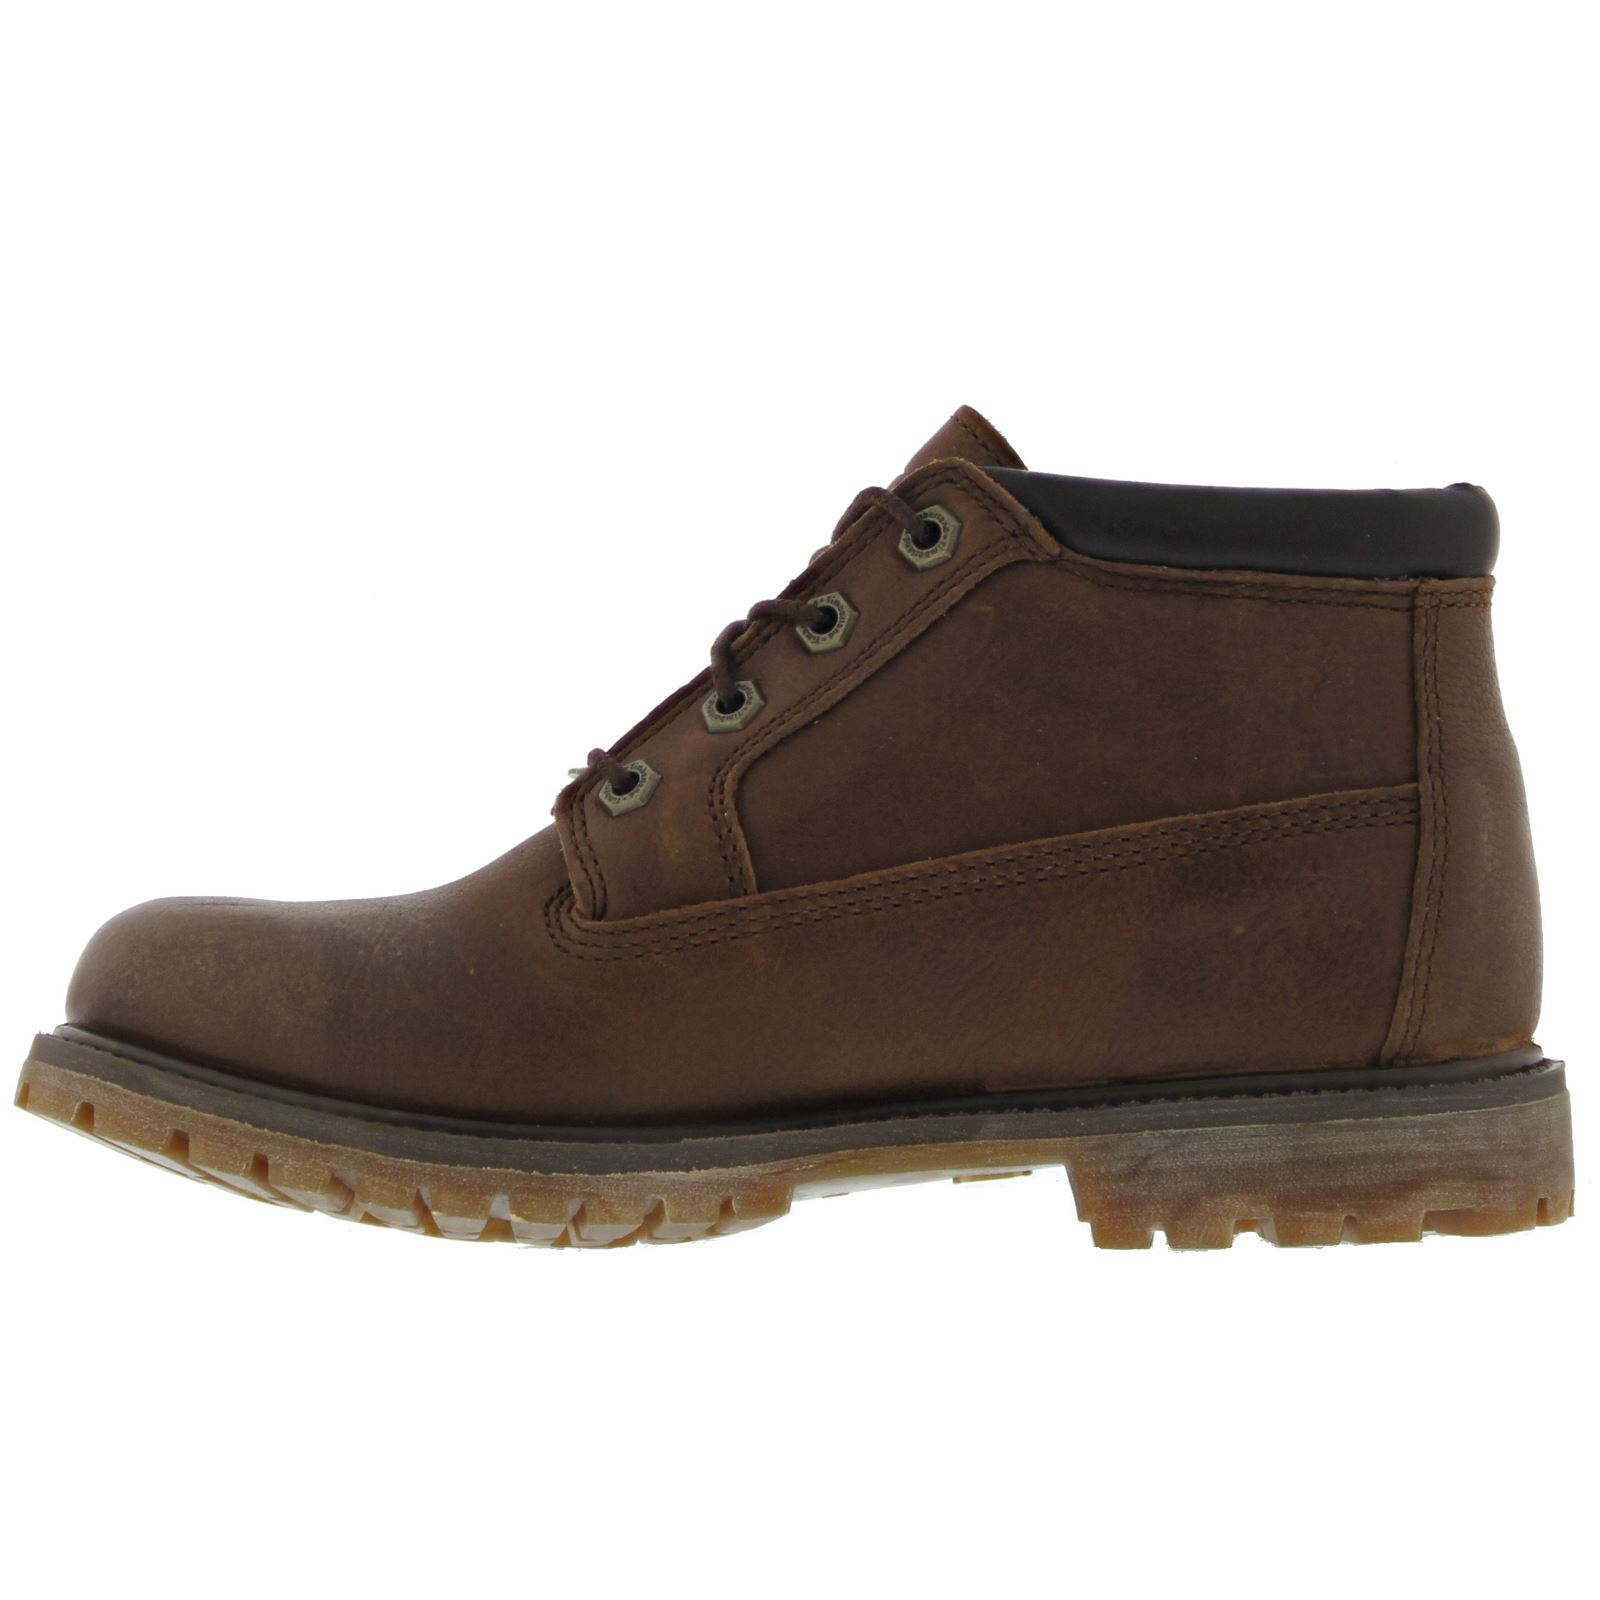 Timberland Nellie Chukka Double Dark Brown Womens Boots